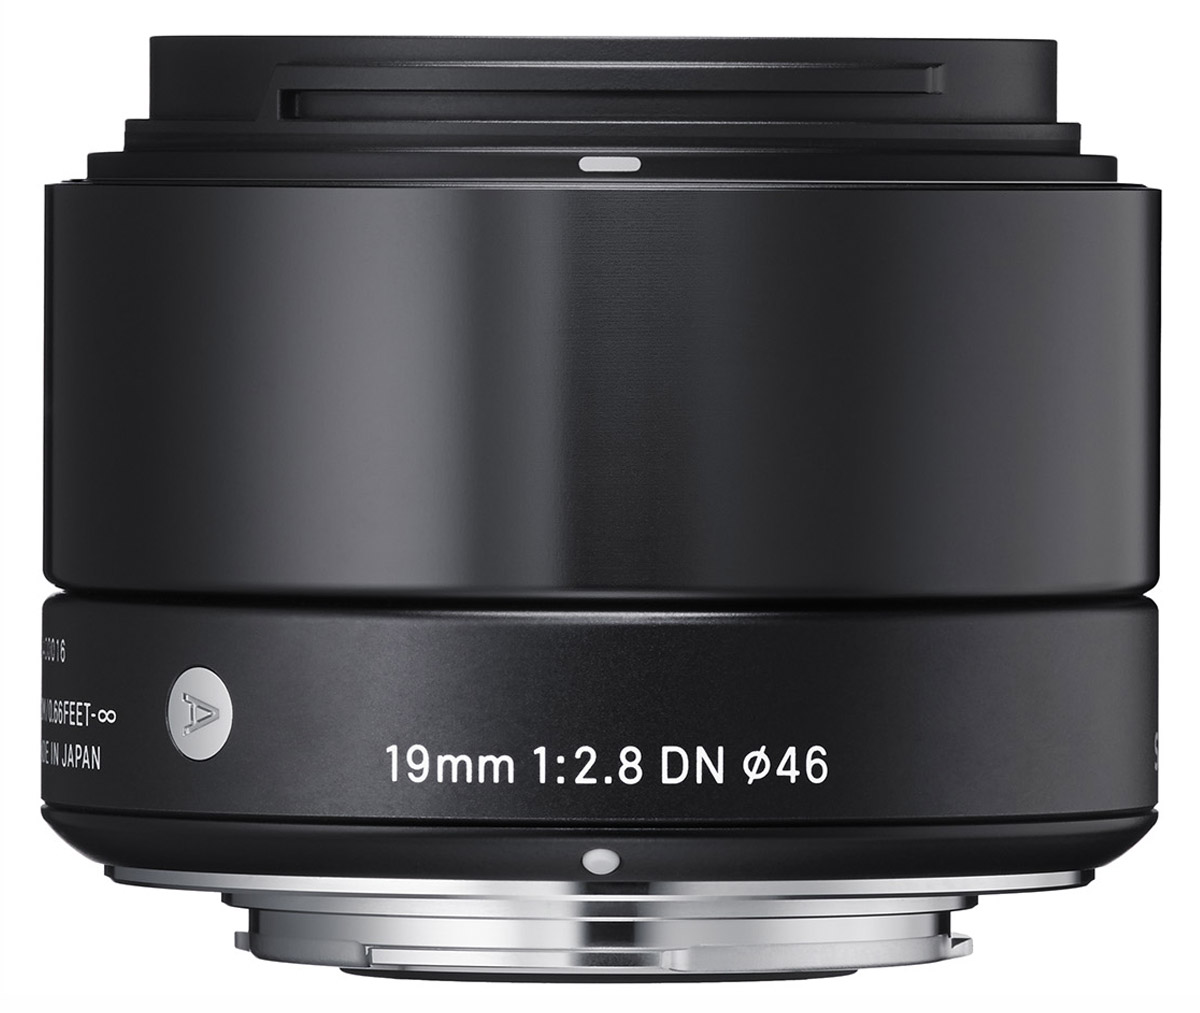 Sigma AF 19mm f/2.8 DN/A, Black широкоугольный объектив для Micro 4/3